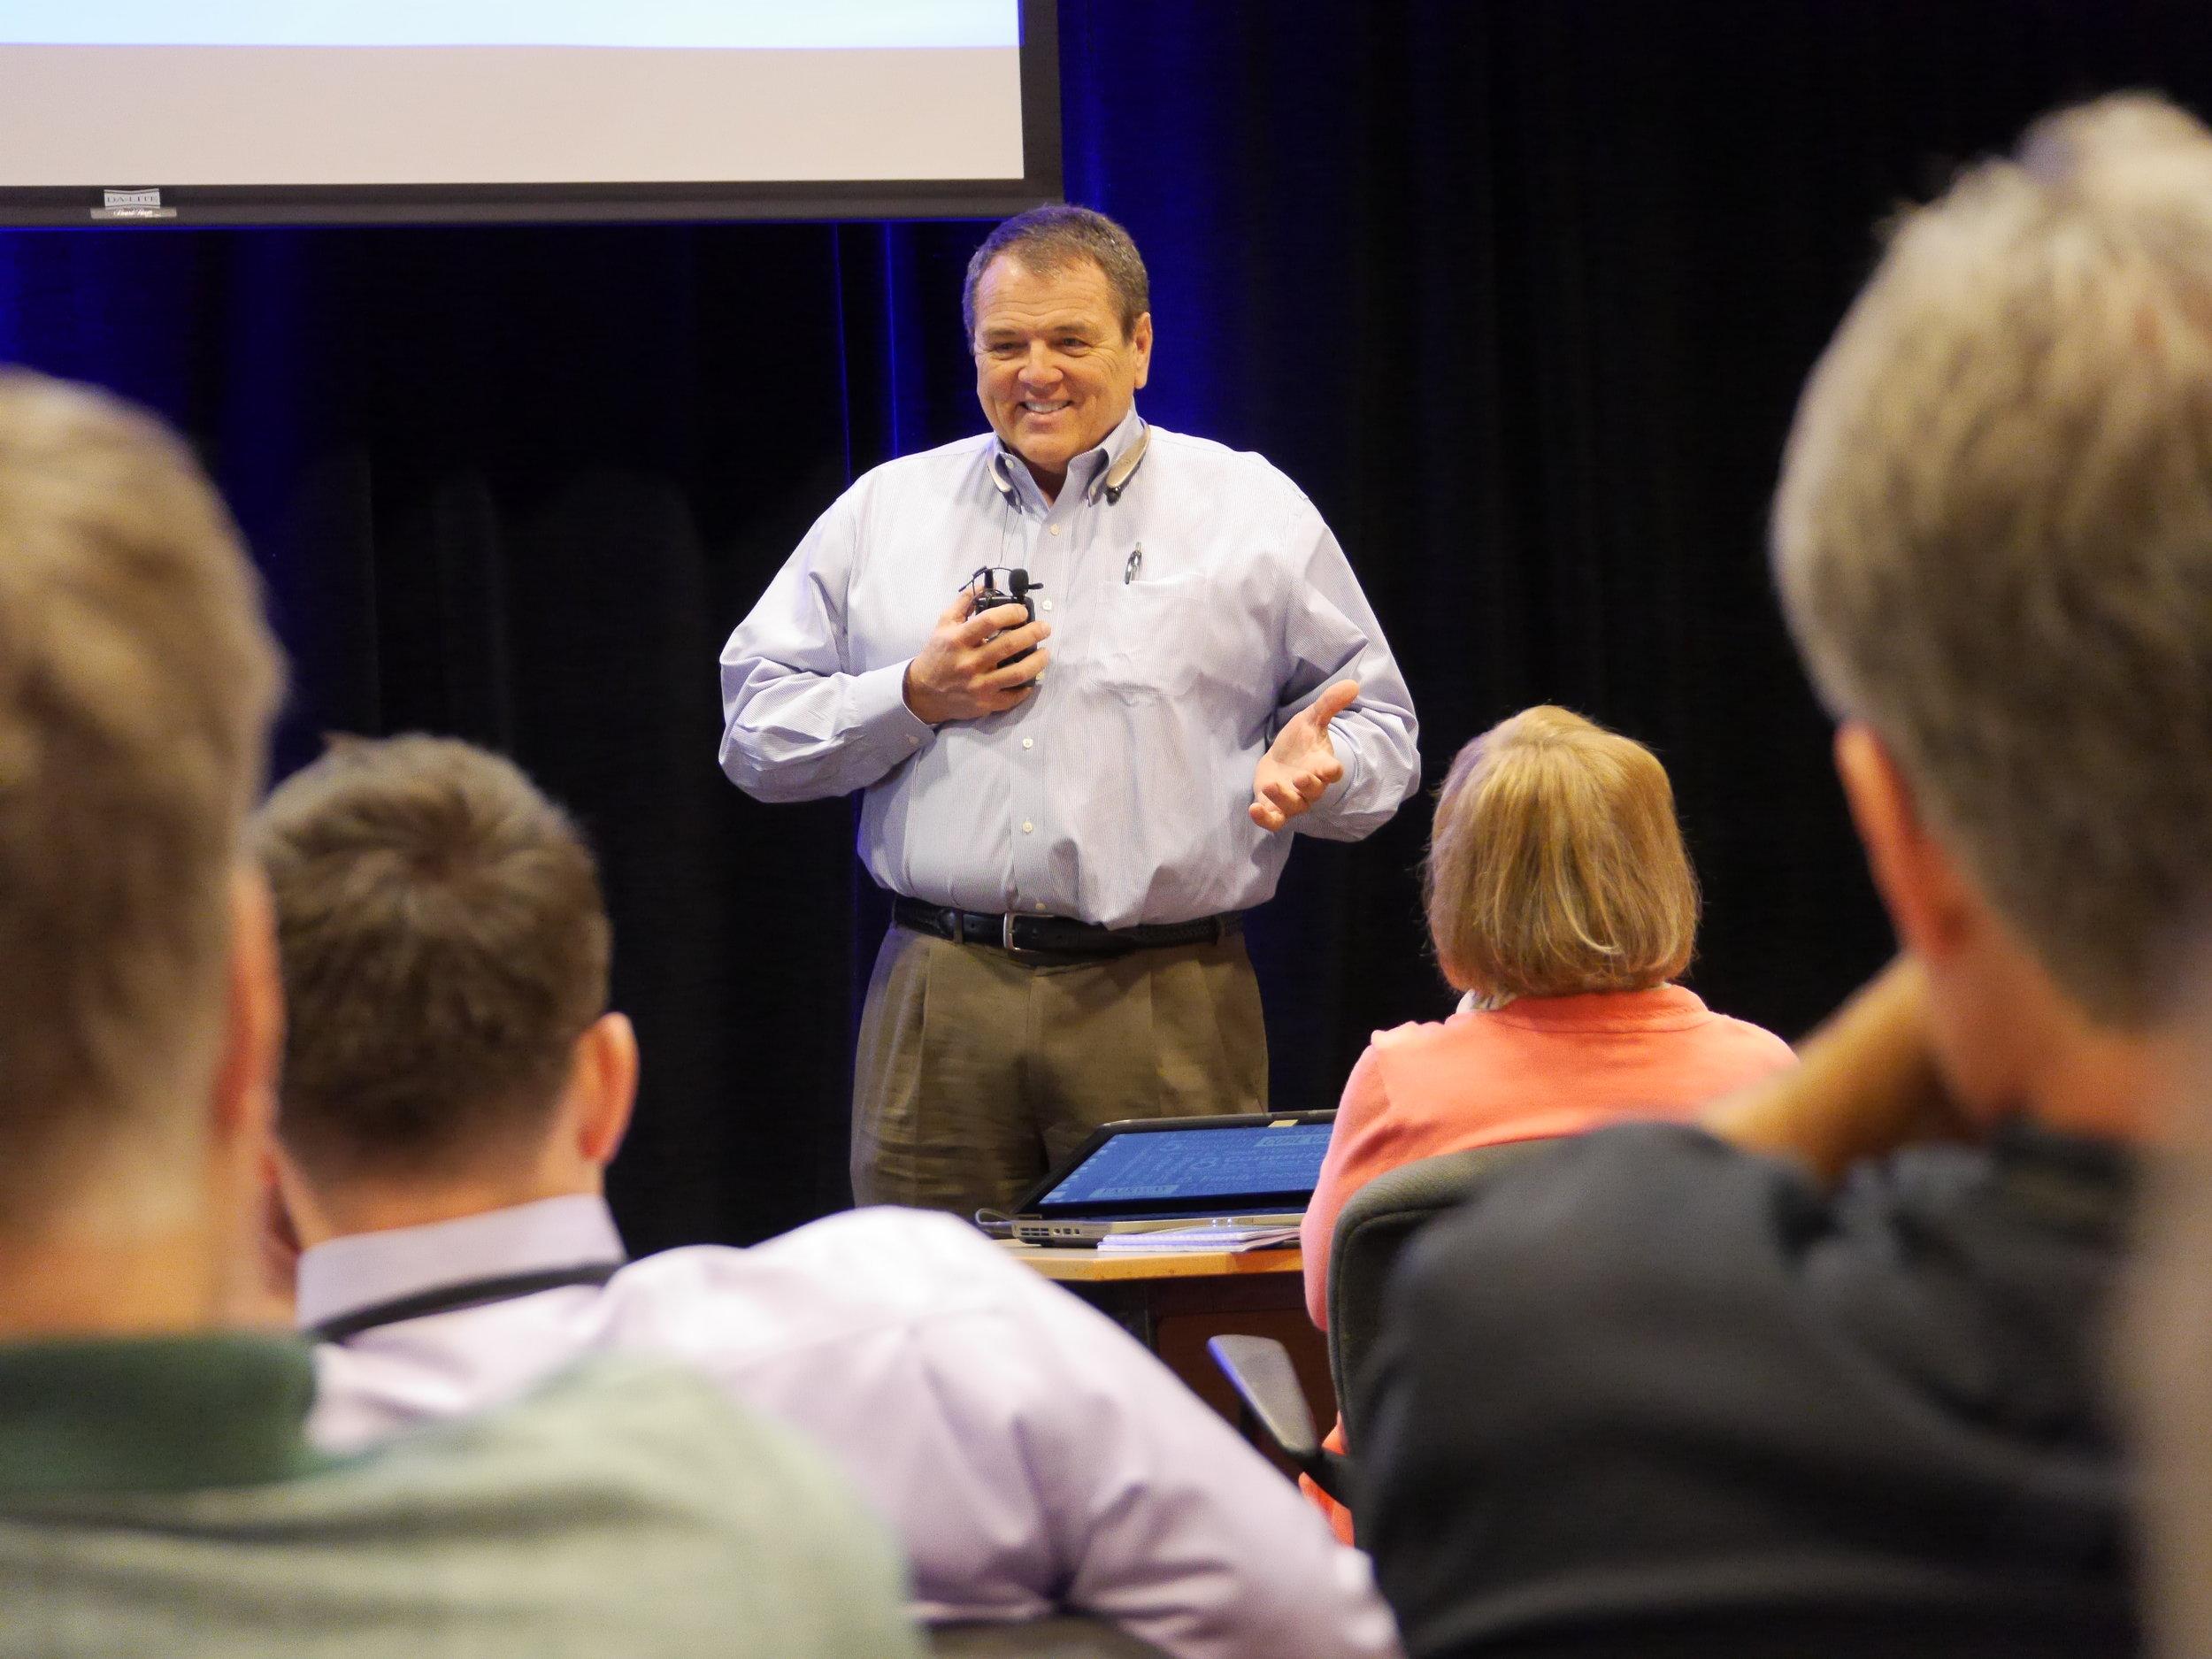 Read Steve Polston CEO/Founder bio